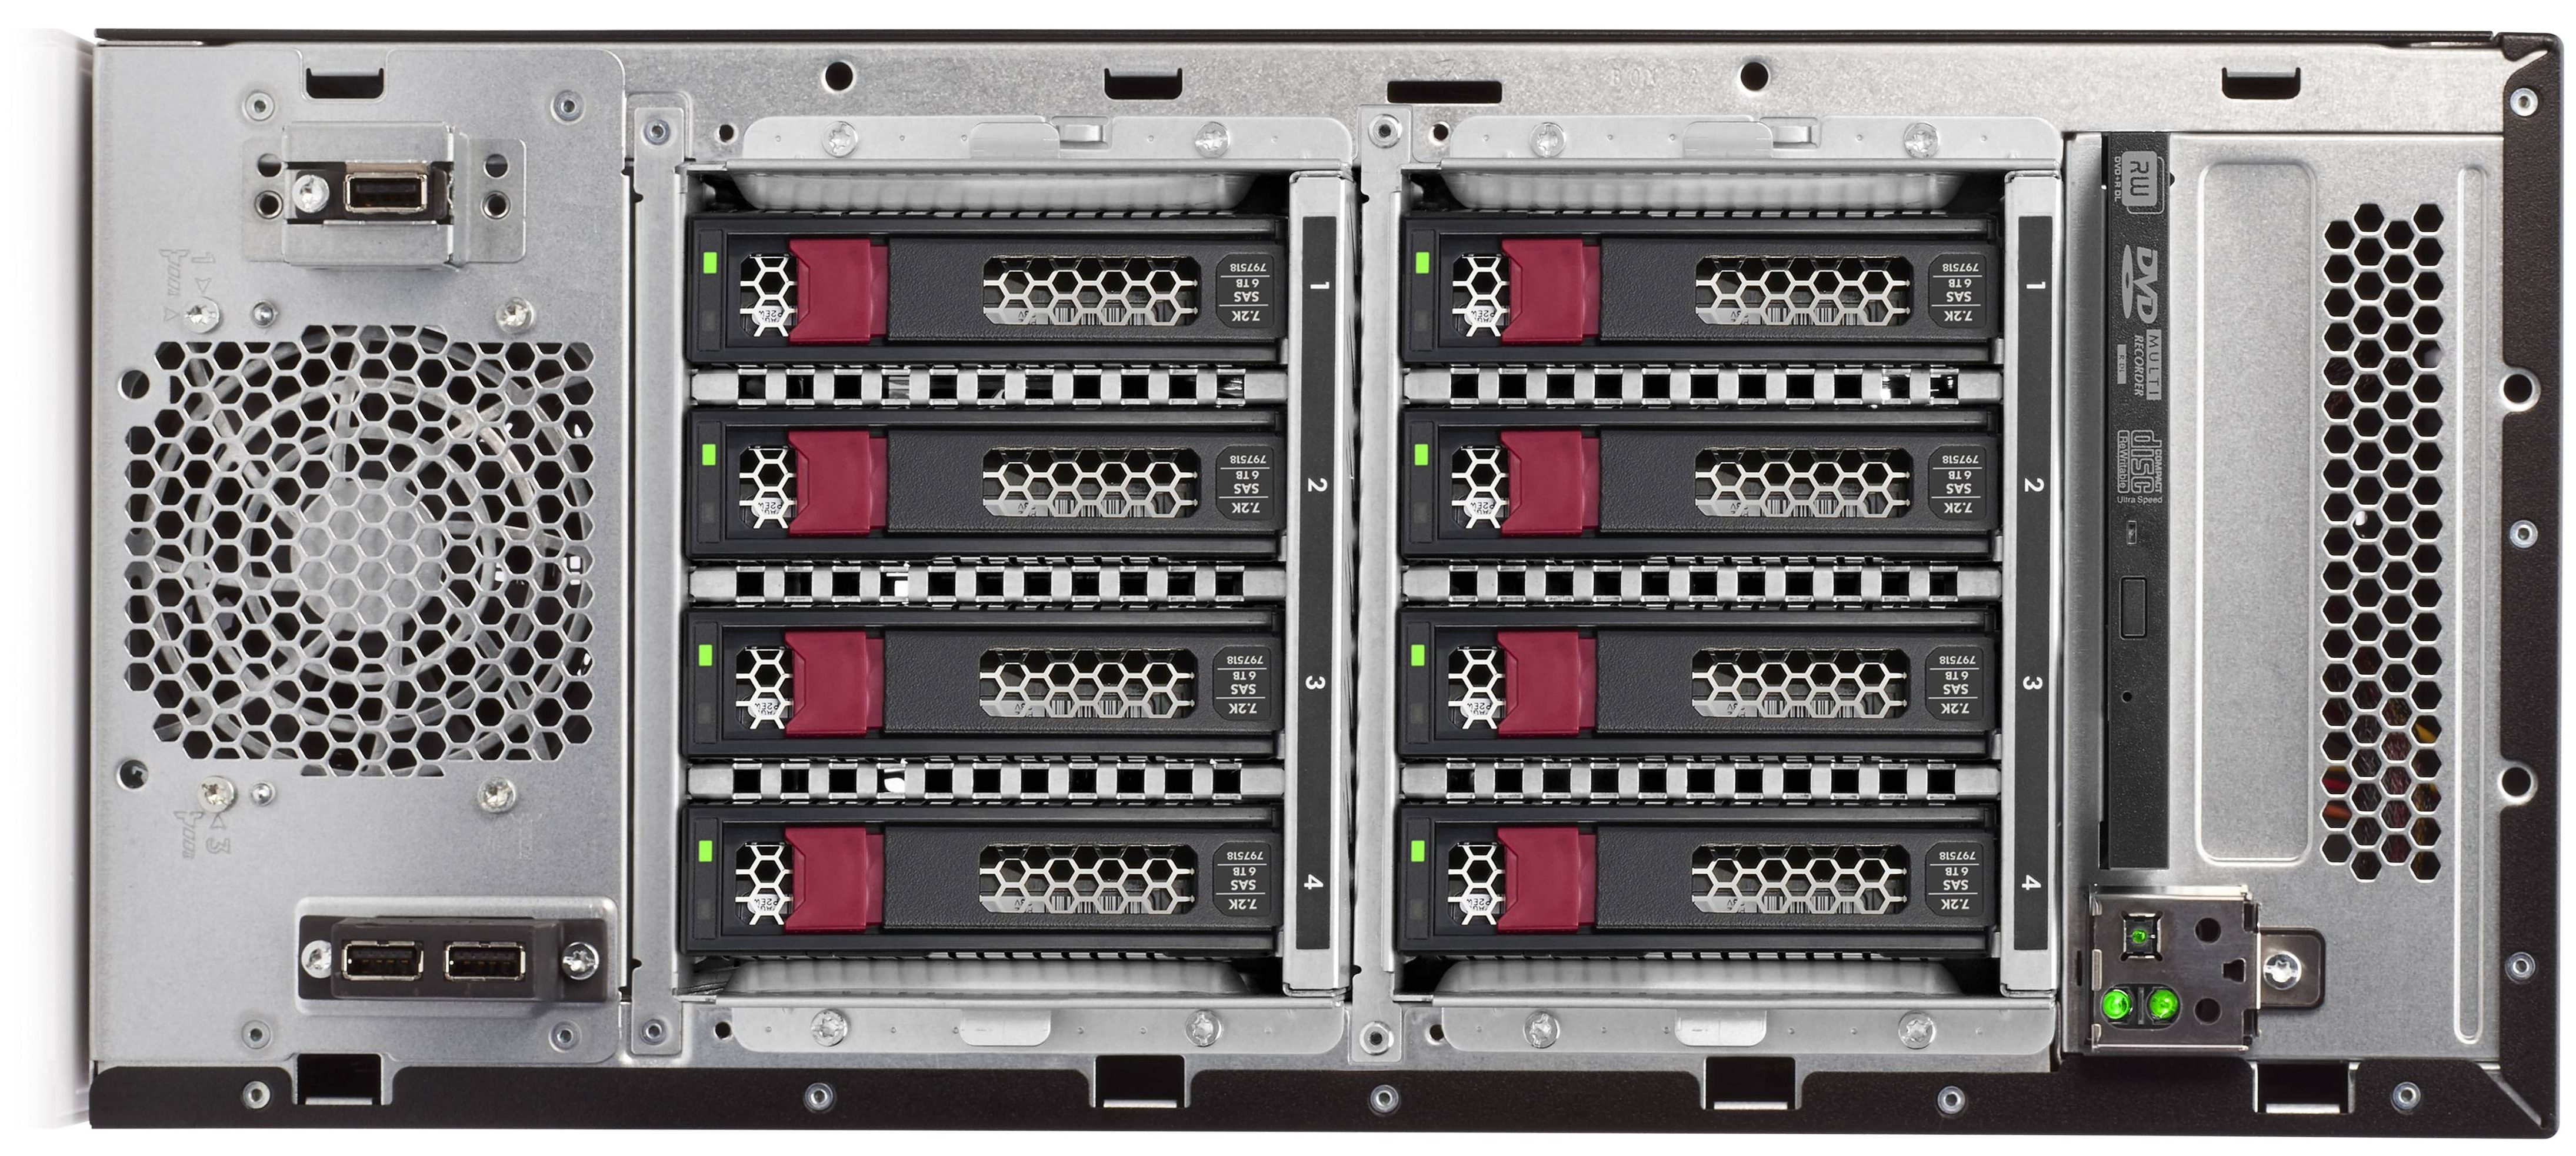 ML110 Gen10 8LFF